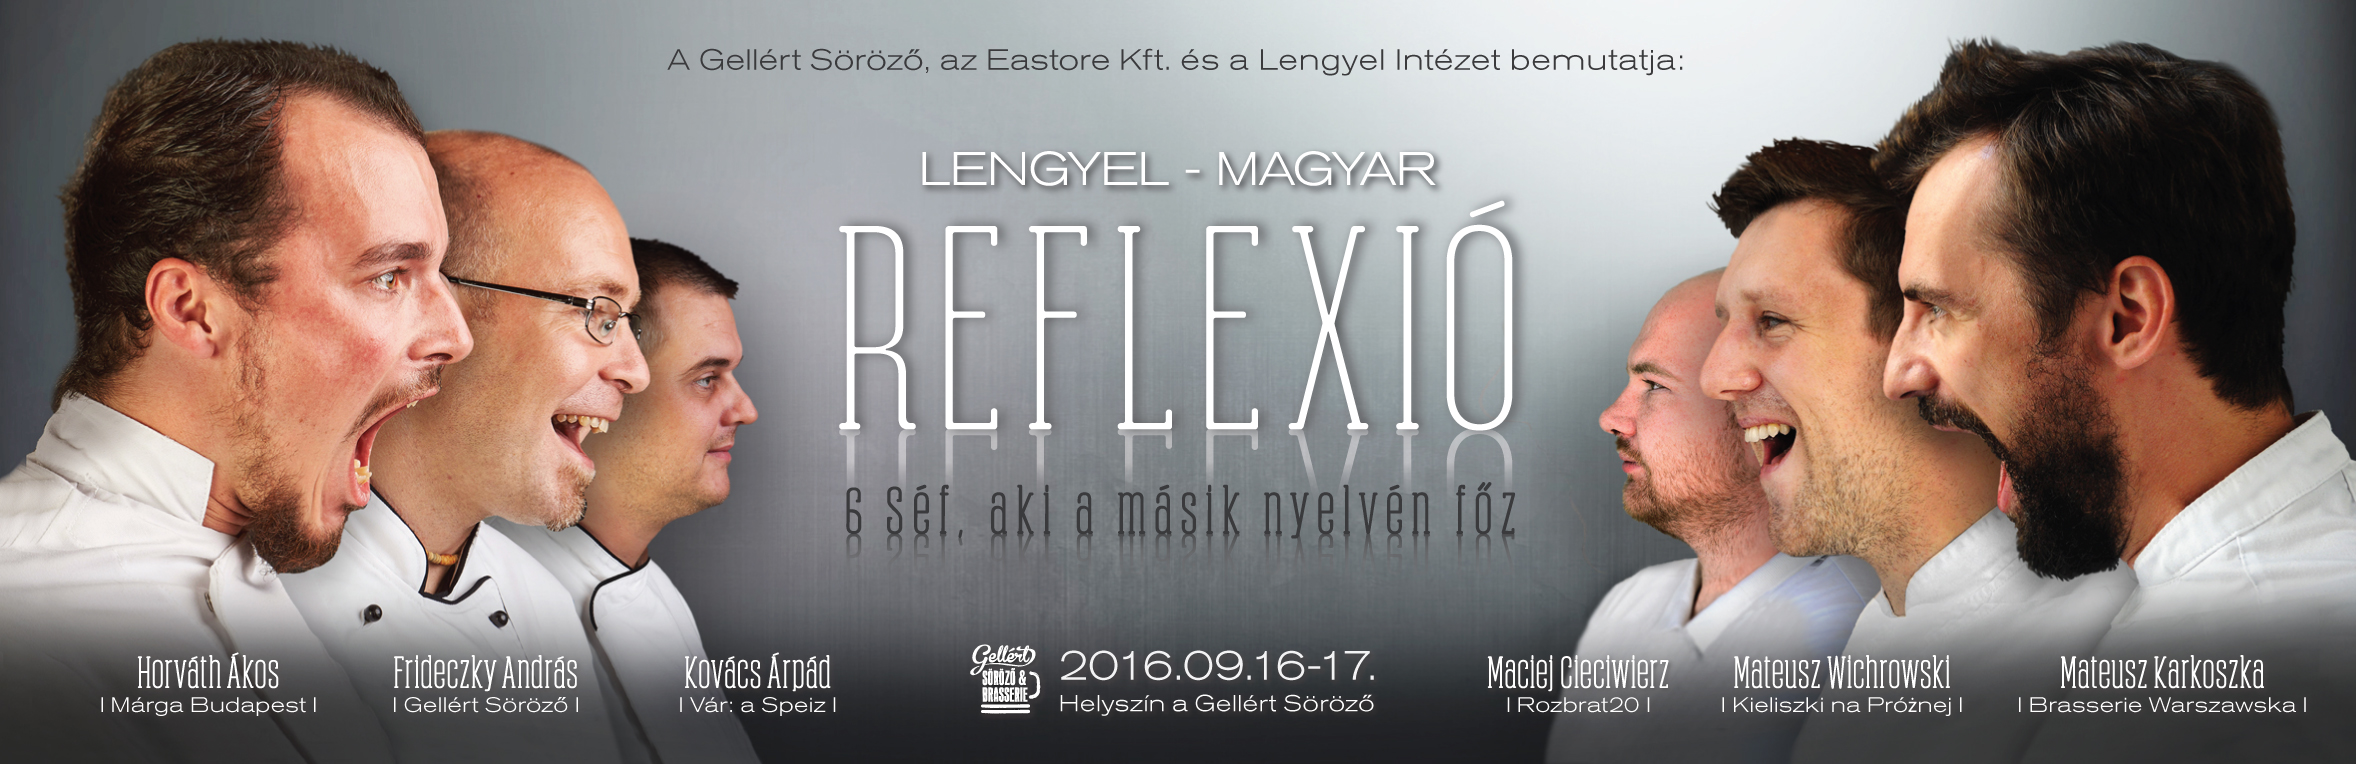 lengyel-magyar-reflexio-gellert-sorozo.jpg